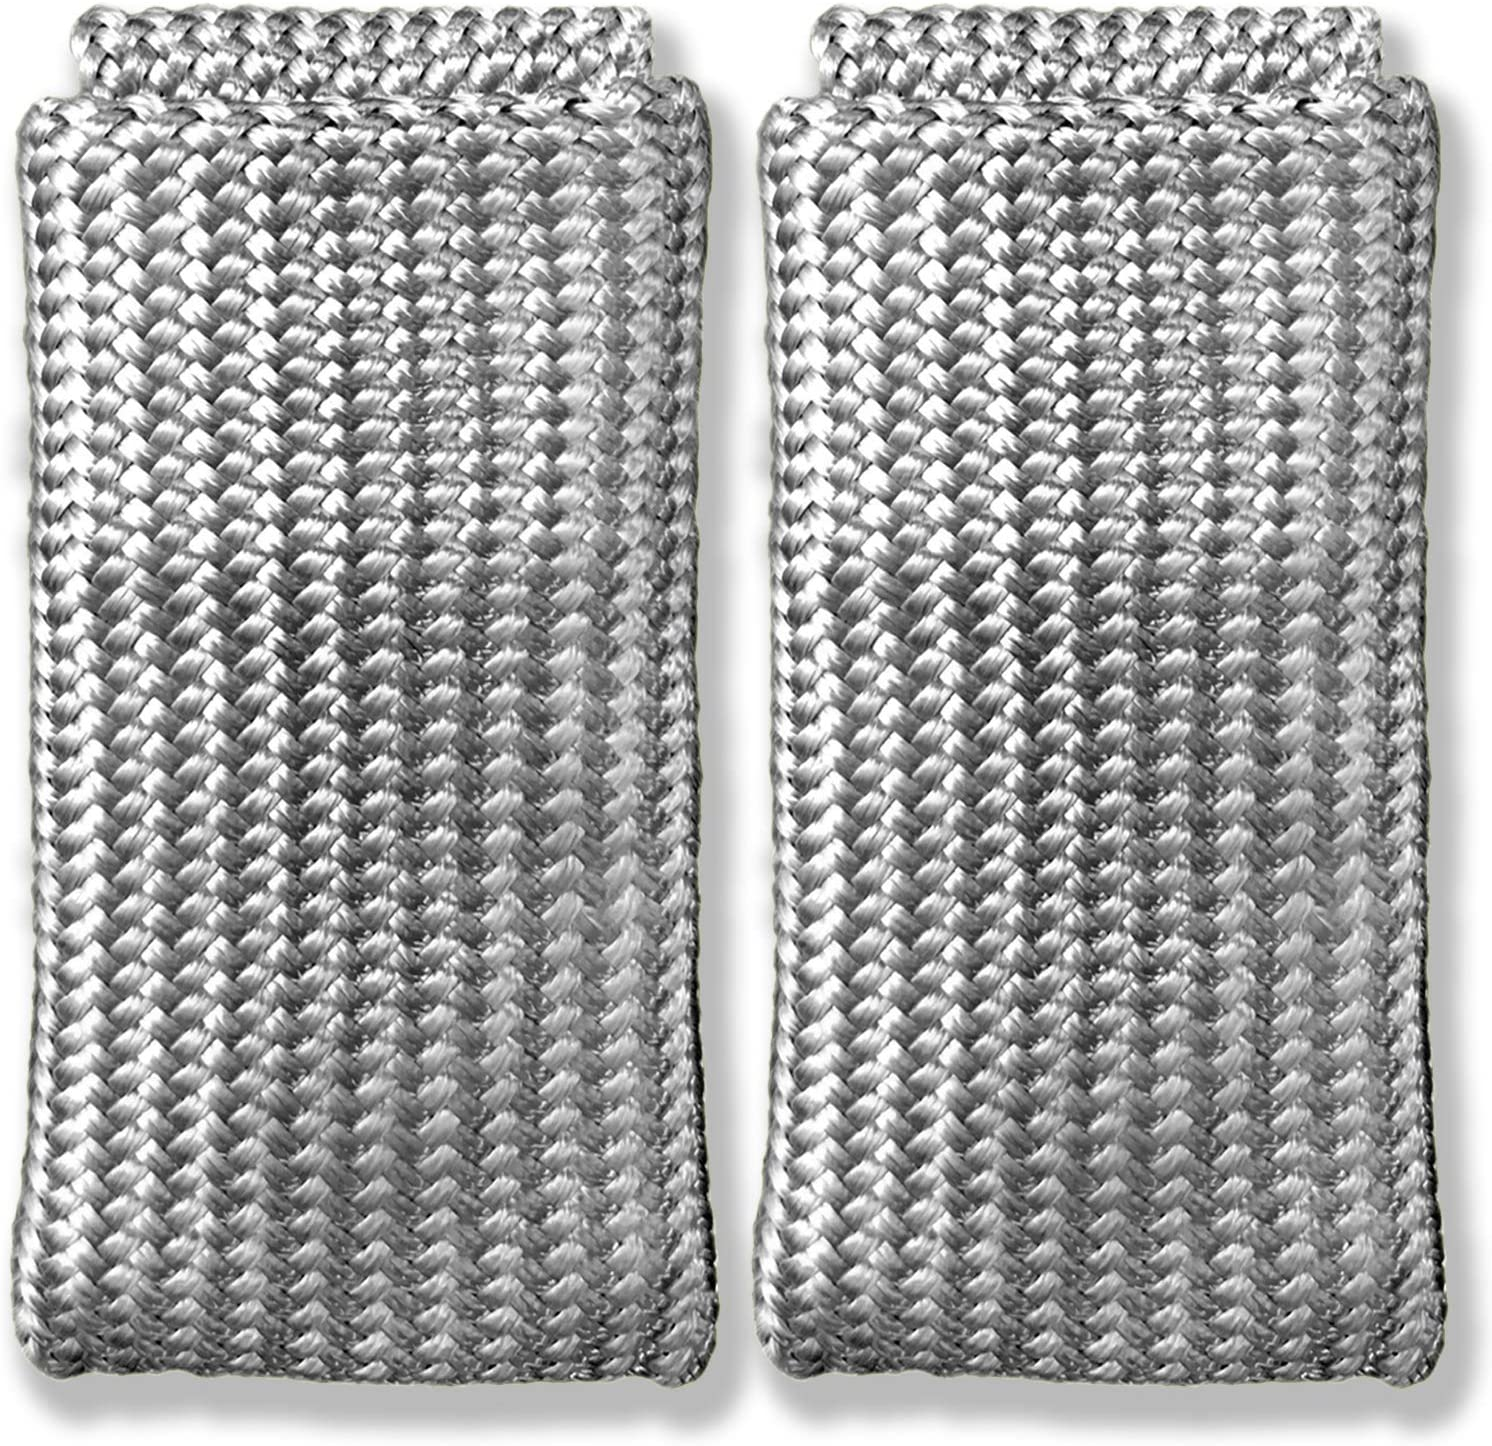 AIC WELD Welding Tips & Tricks Tig Finger Heat Shield (2PK) - -